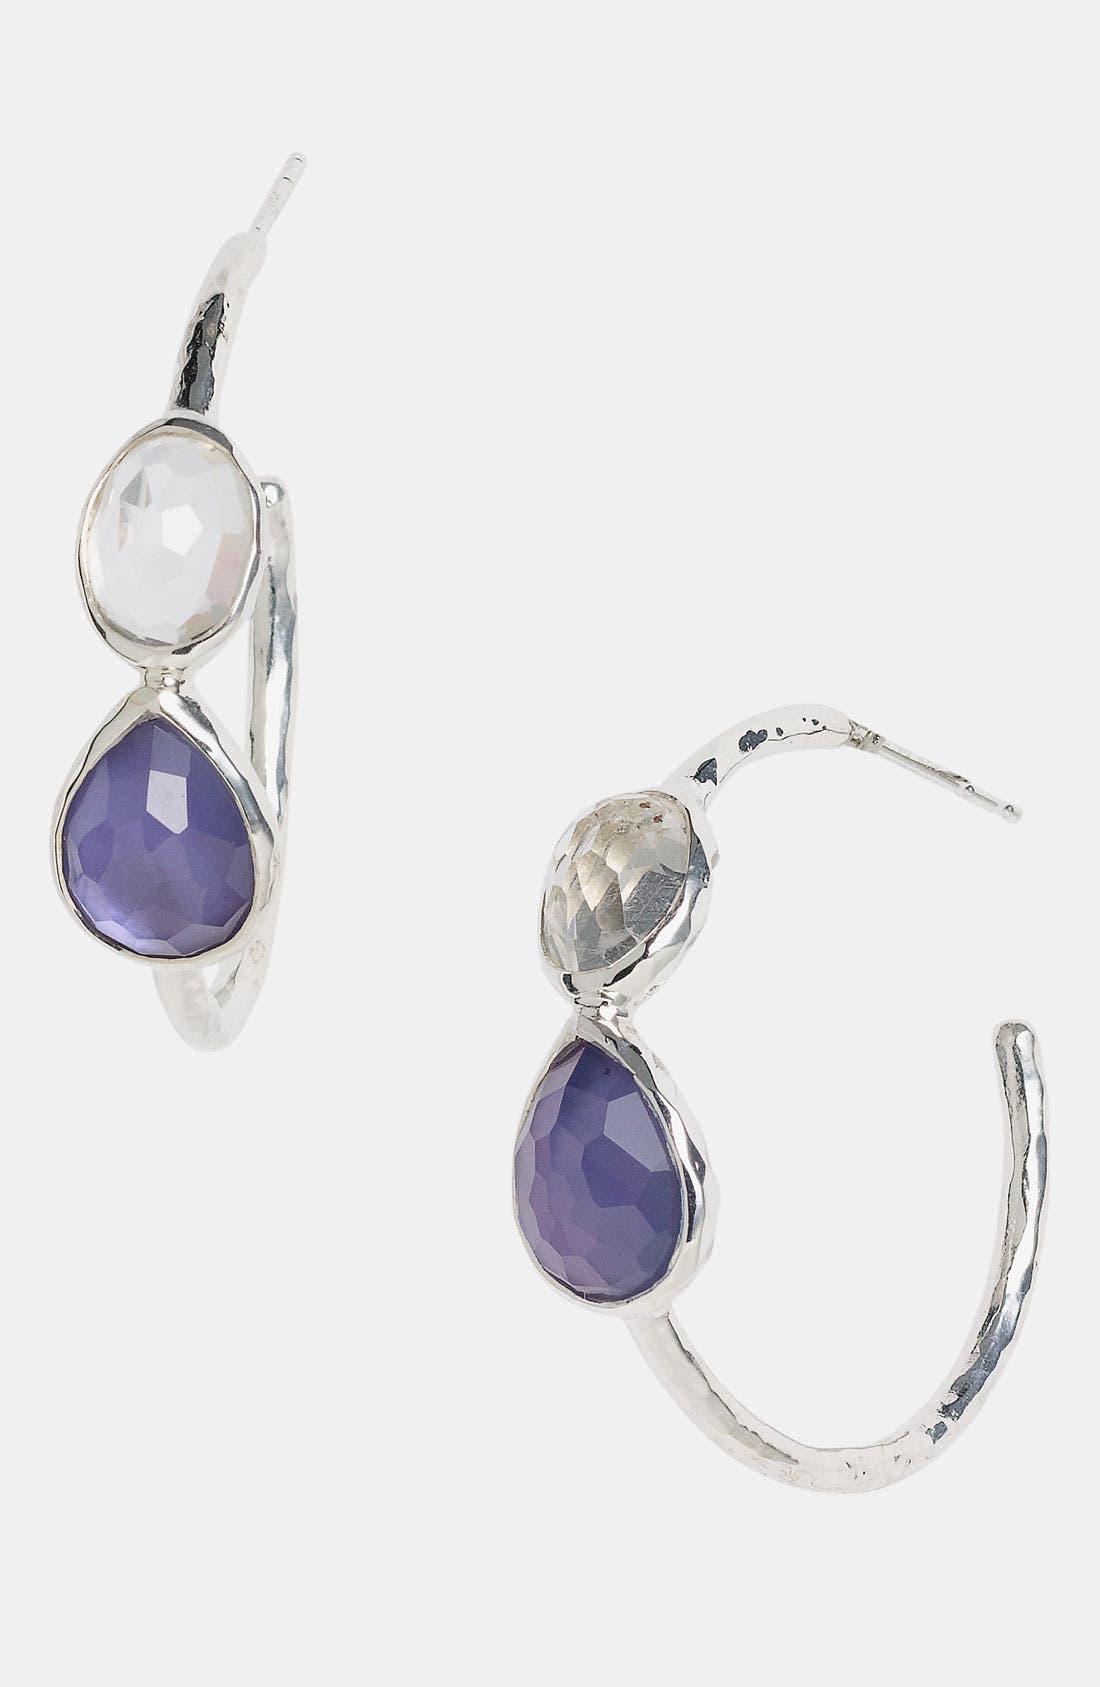 Alternate Image 1 Selected - Ippolita 'Gelato' Two-Stone Small Hoop Earrings (Nordstrom Exclusive)